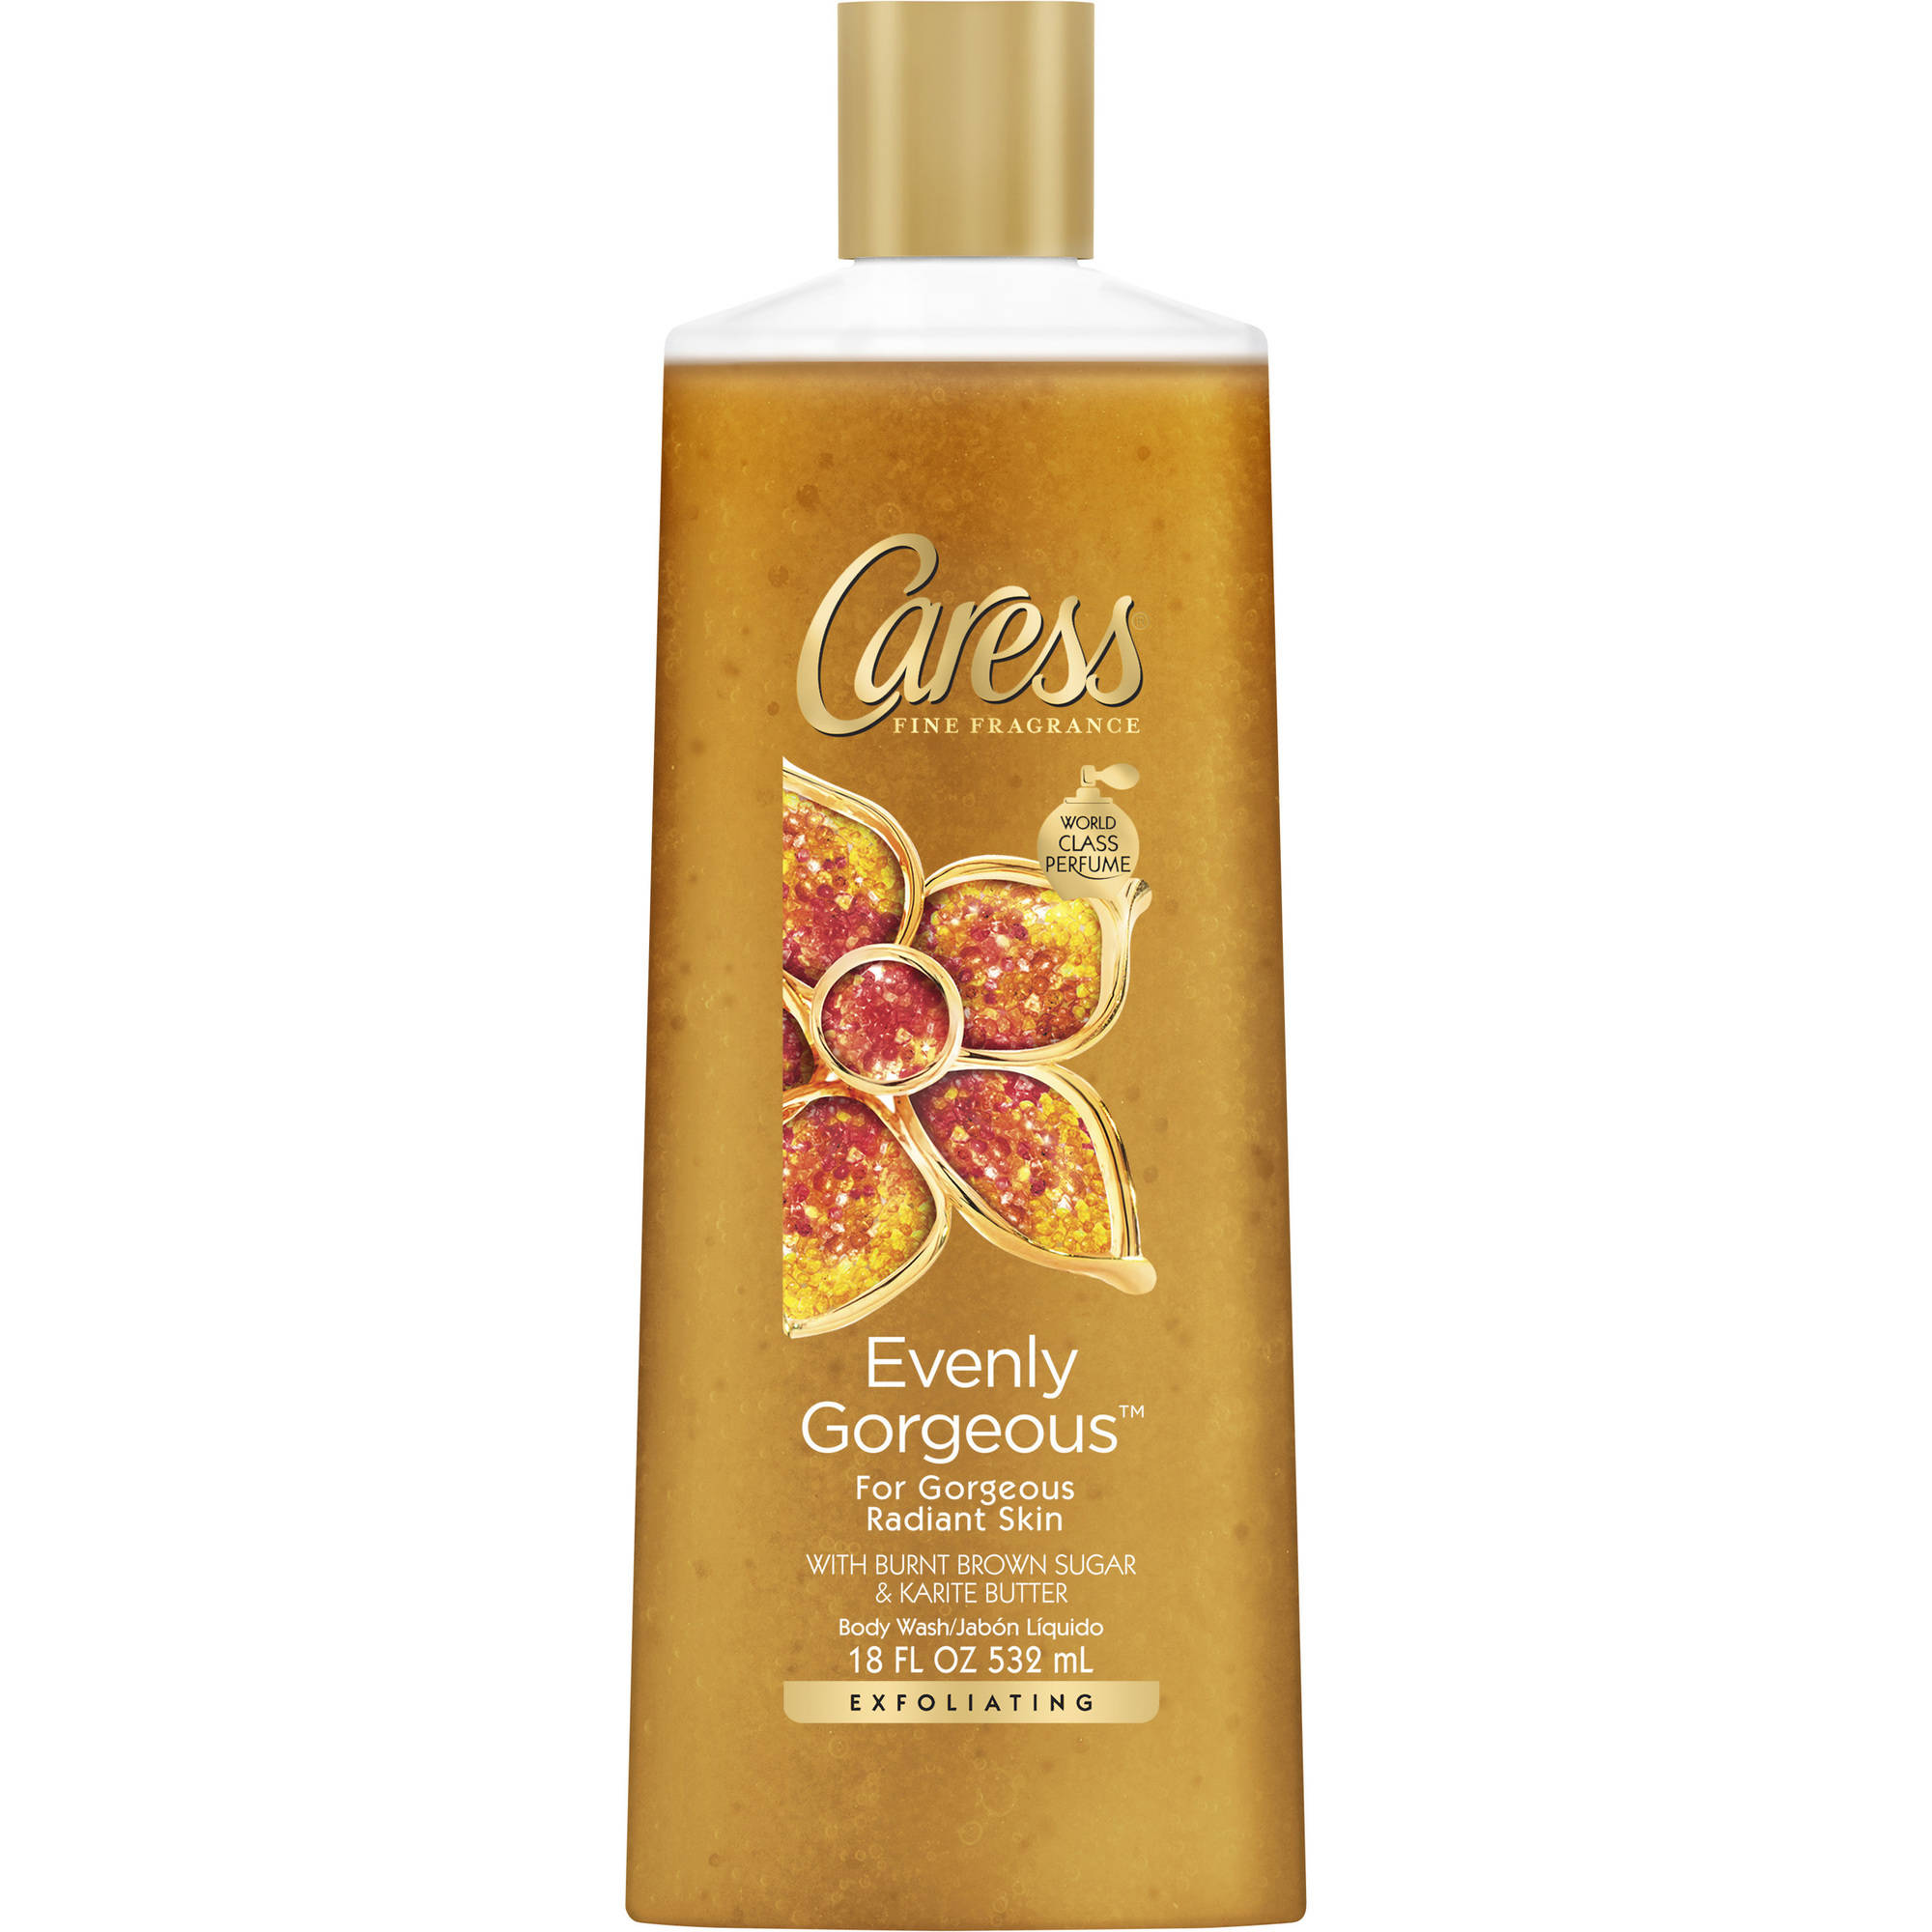 Caress Evenly Gorgeous Exfoliating Body Wash, 18 oz